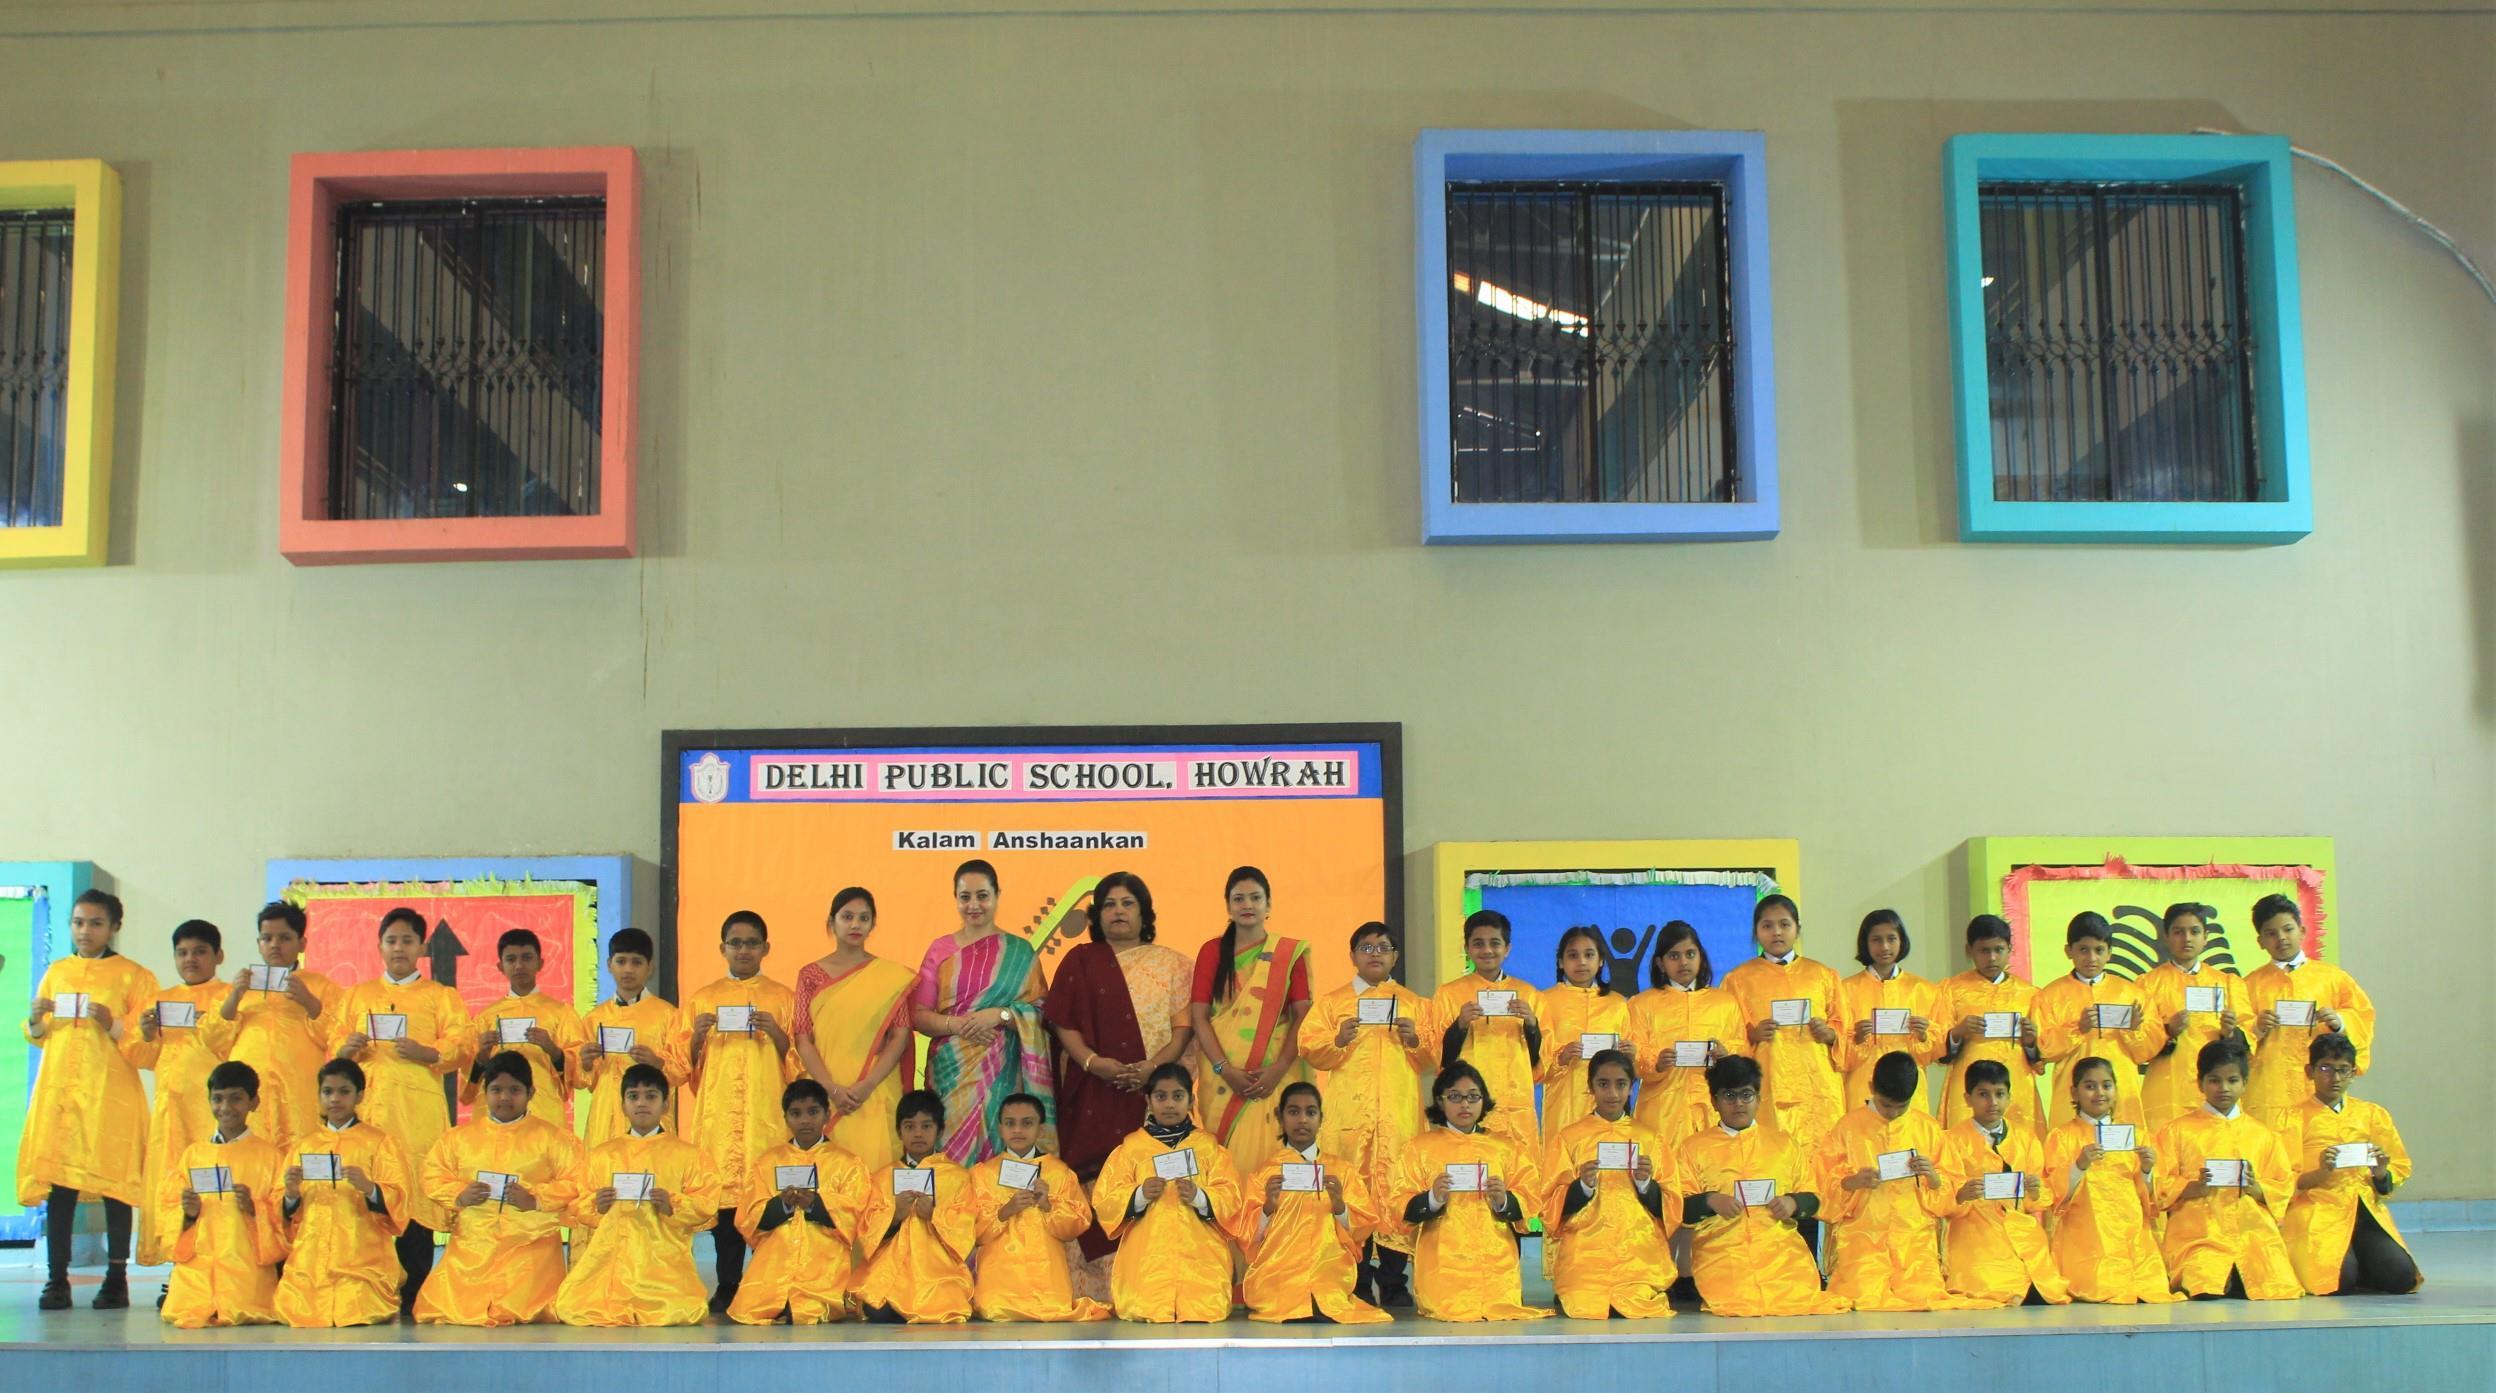 'KalamAnshaankan' at Delhi Public School, Howrah